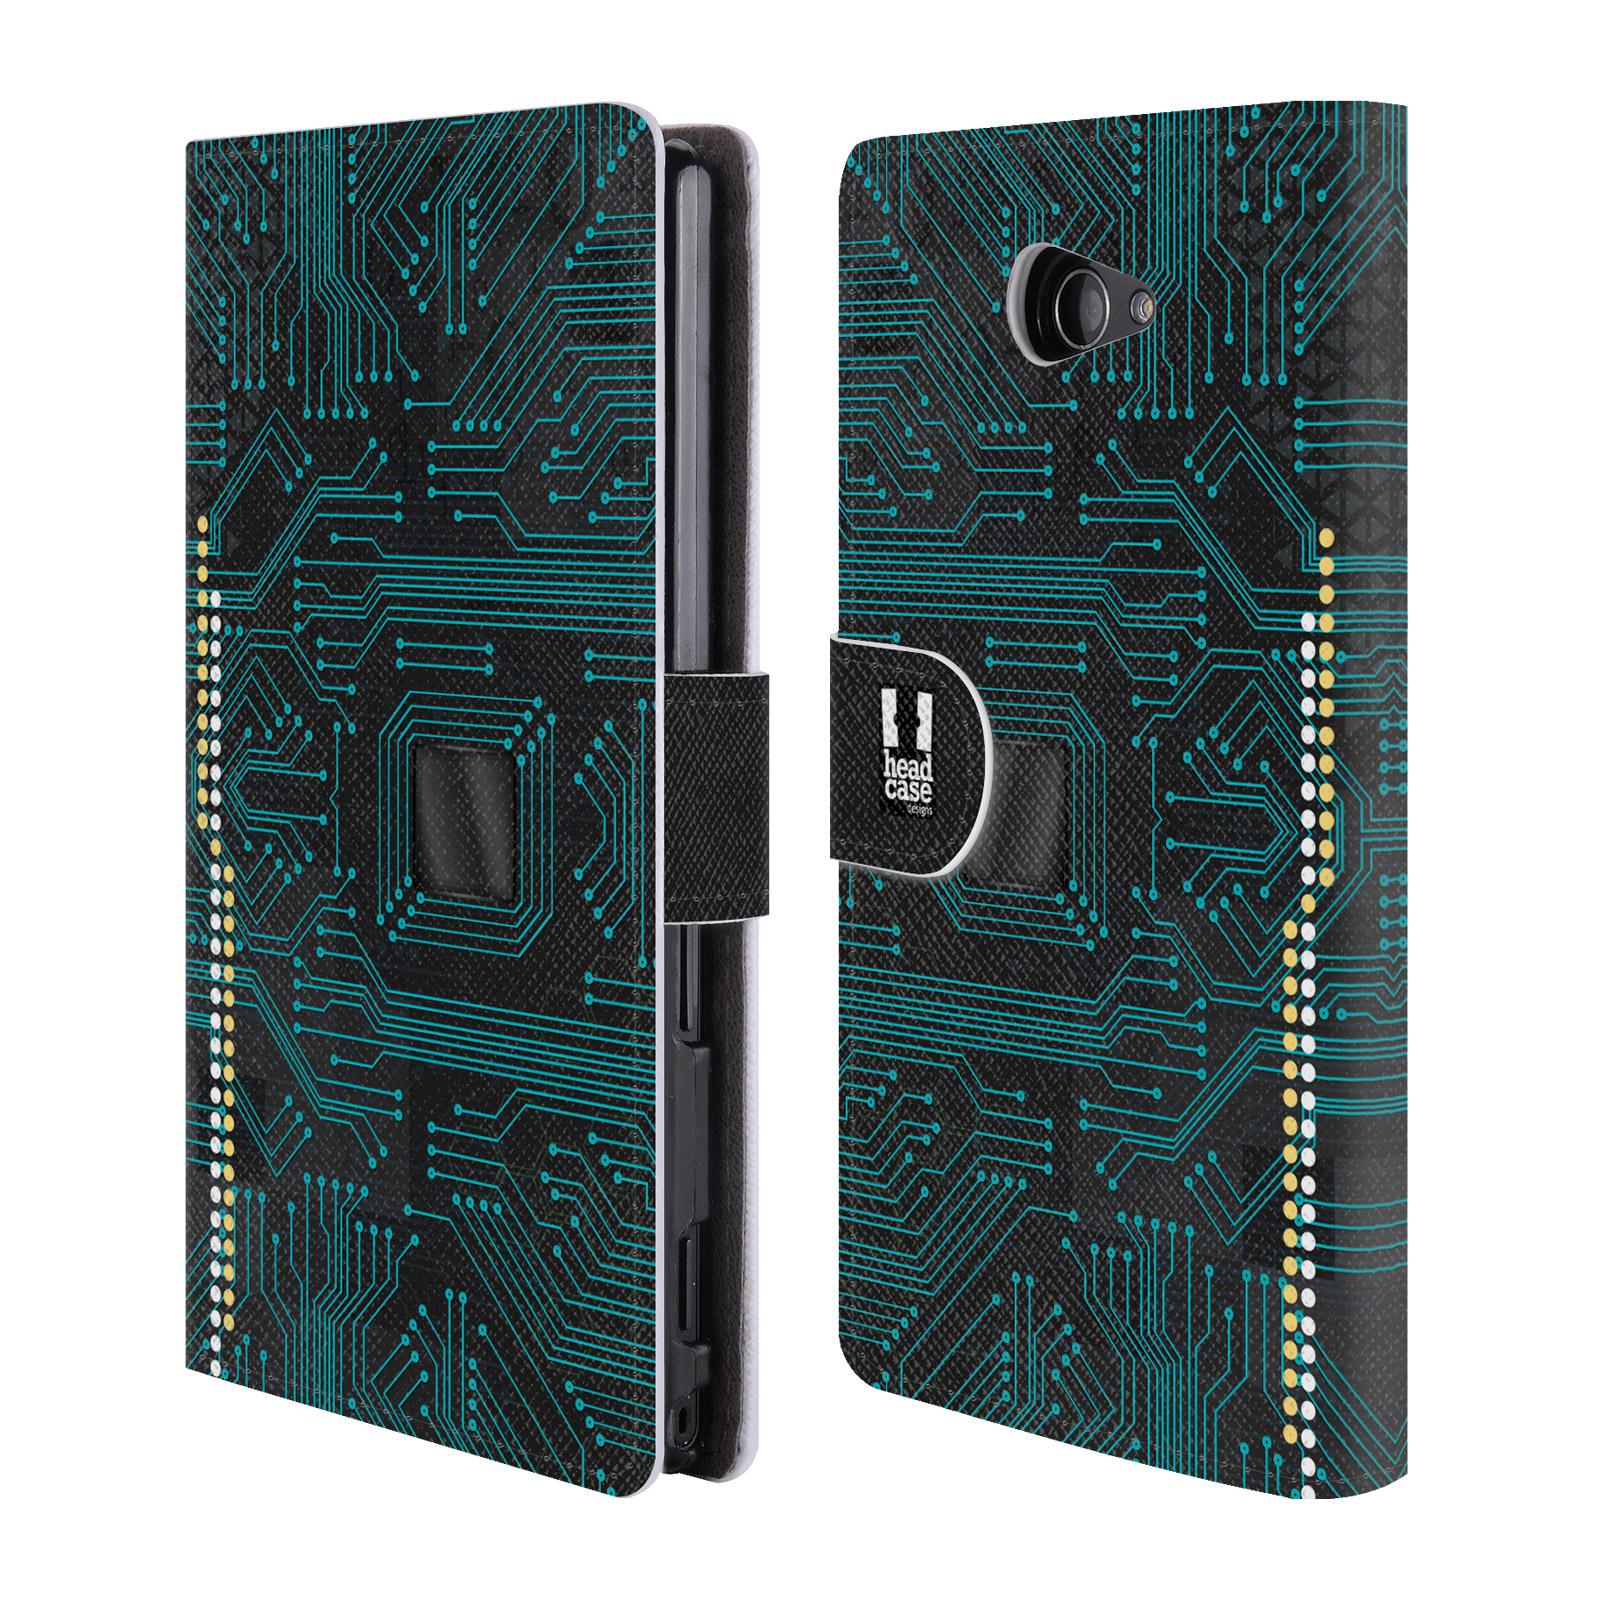 HEAD CASE Flipové pouzdro pro mobil SONY XPERIA M2 počítač základní deska modrá barva